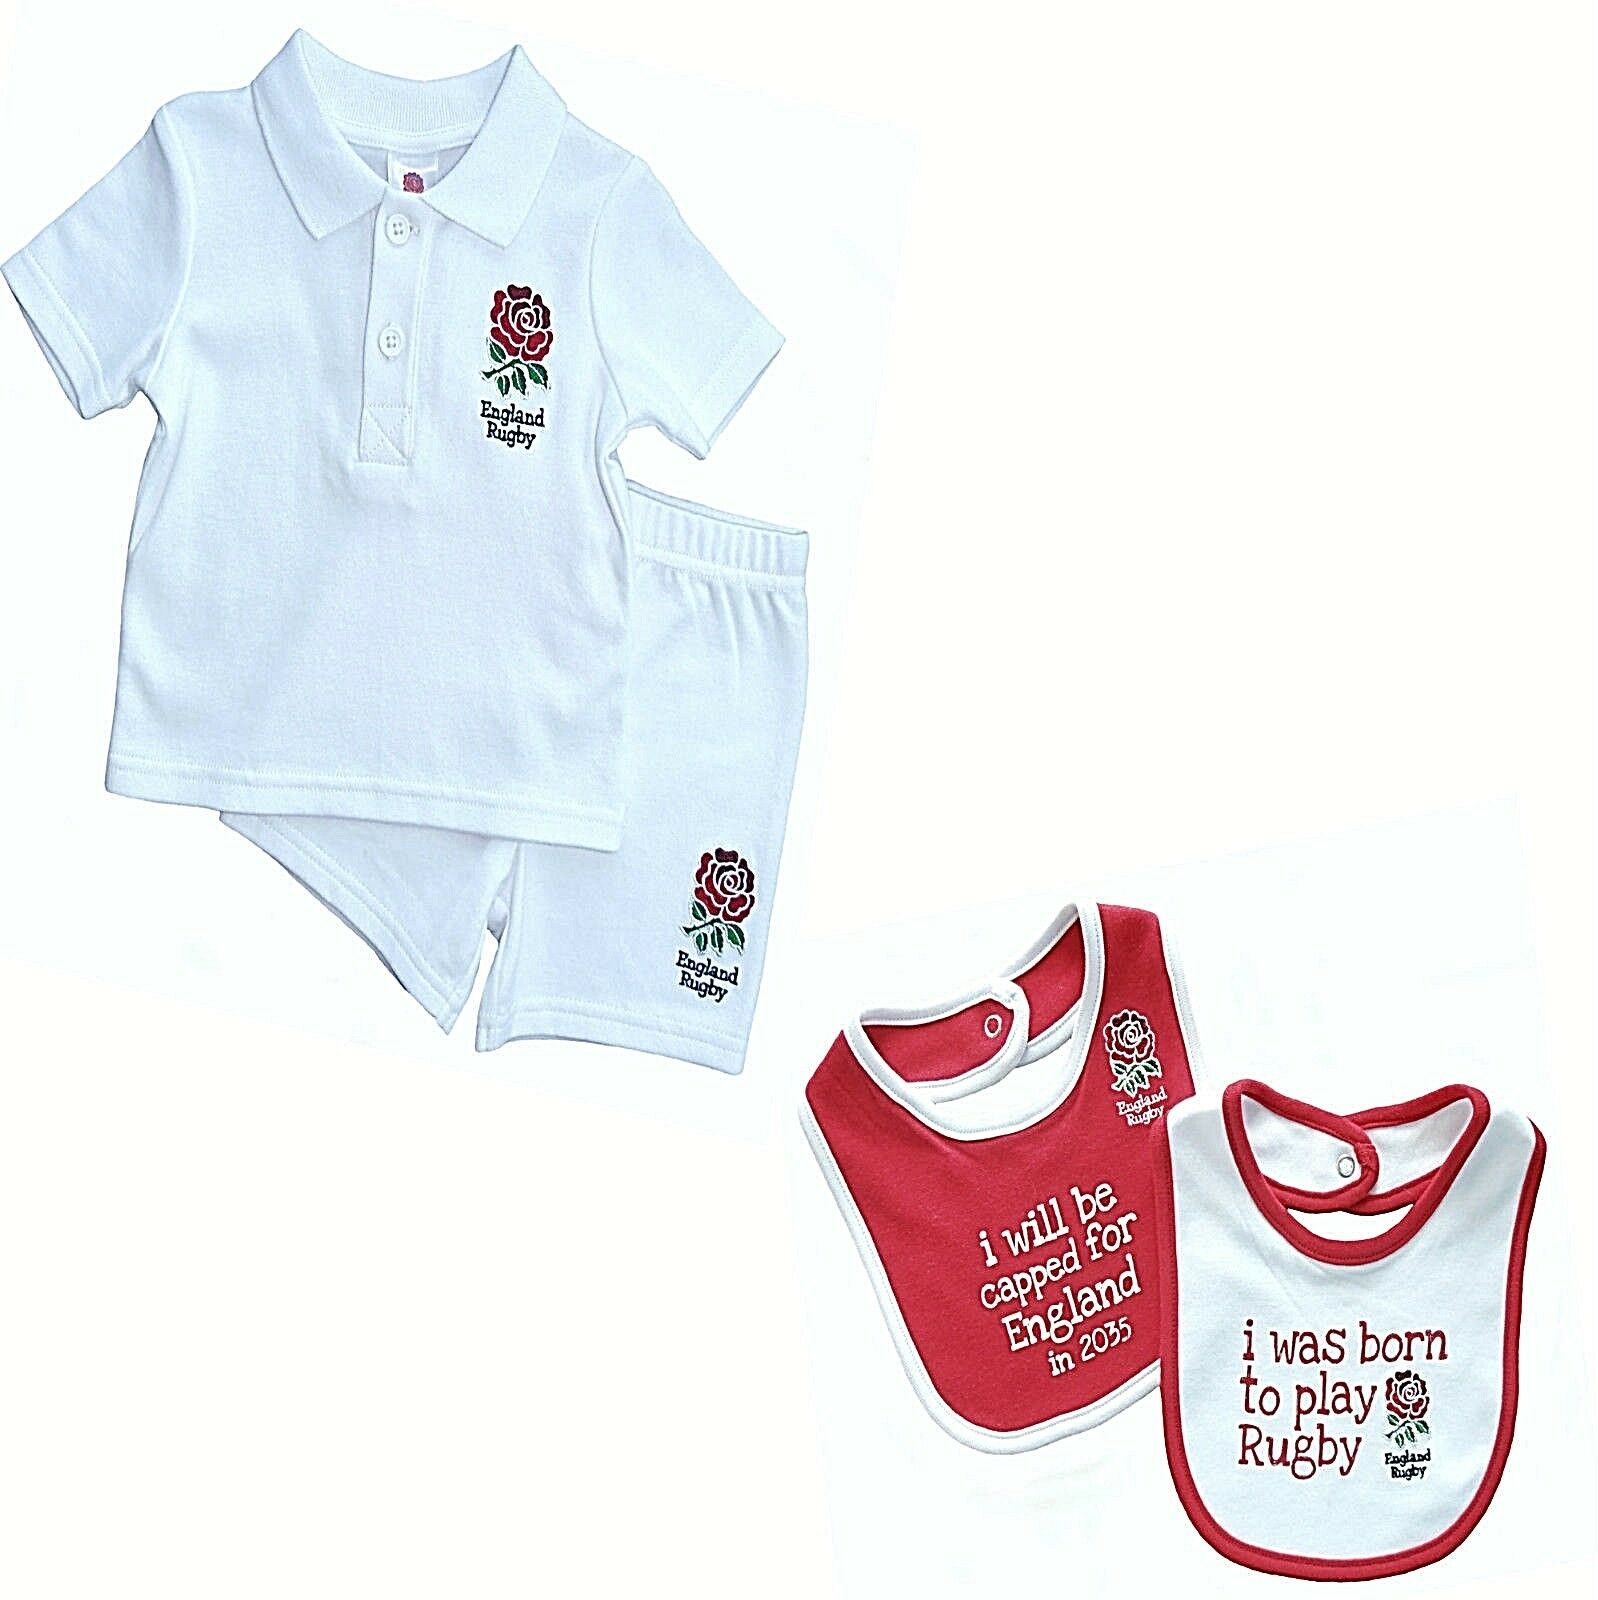 ENGLAND RFU SIX NATIONS RUGBY T SHIRT SHORTS KIT BABY SHORT SLEEVE PRAM SUIT